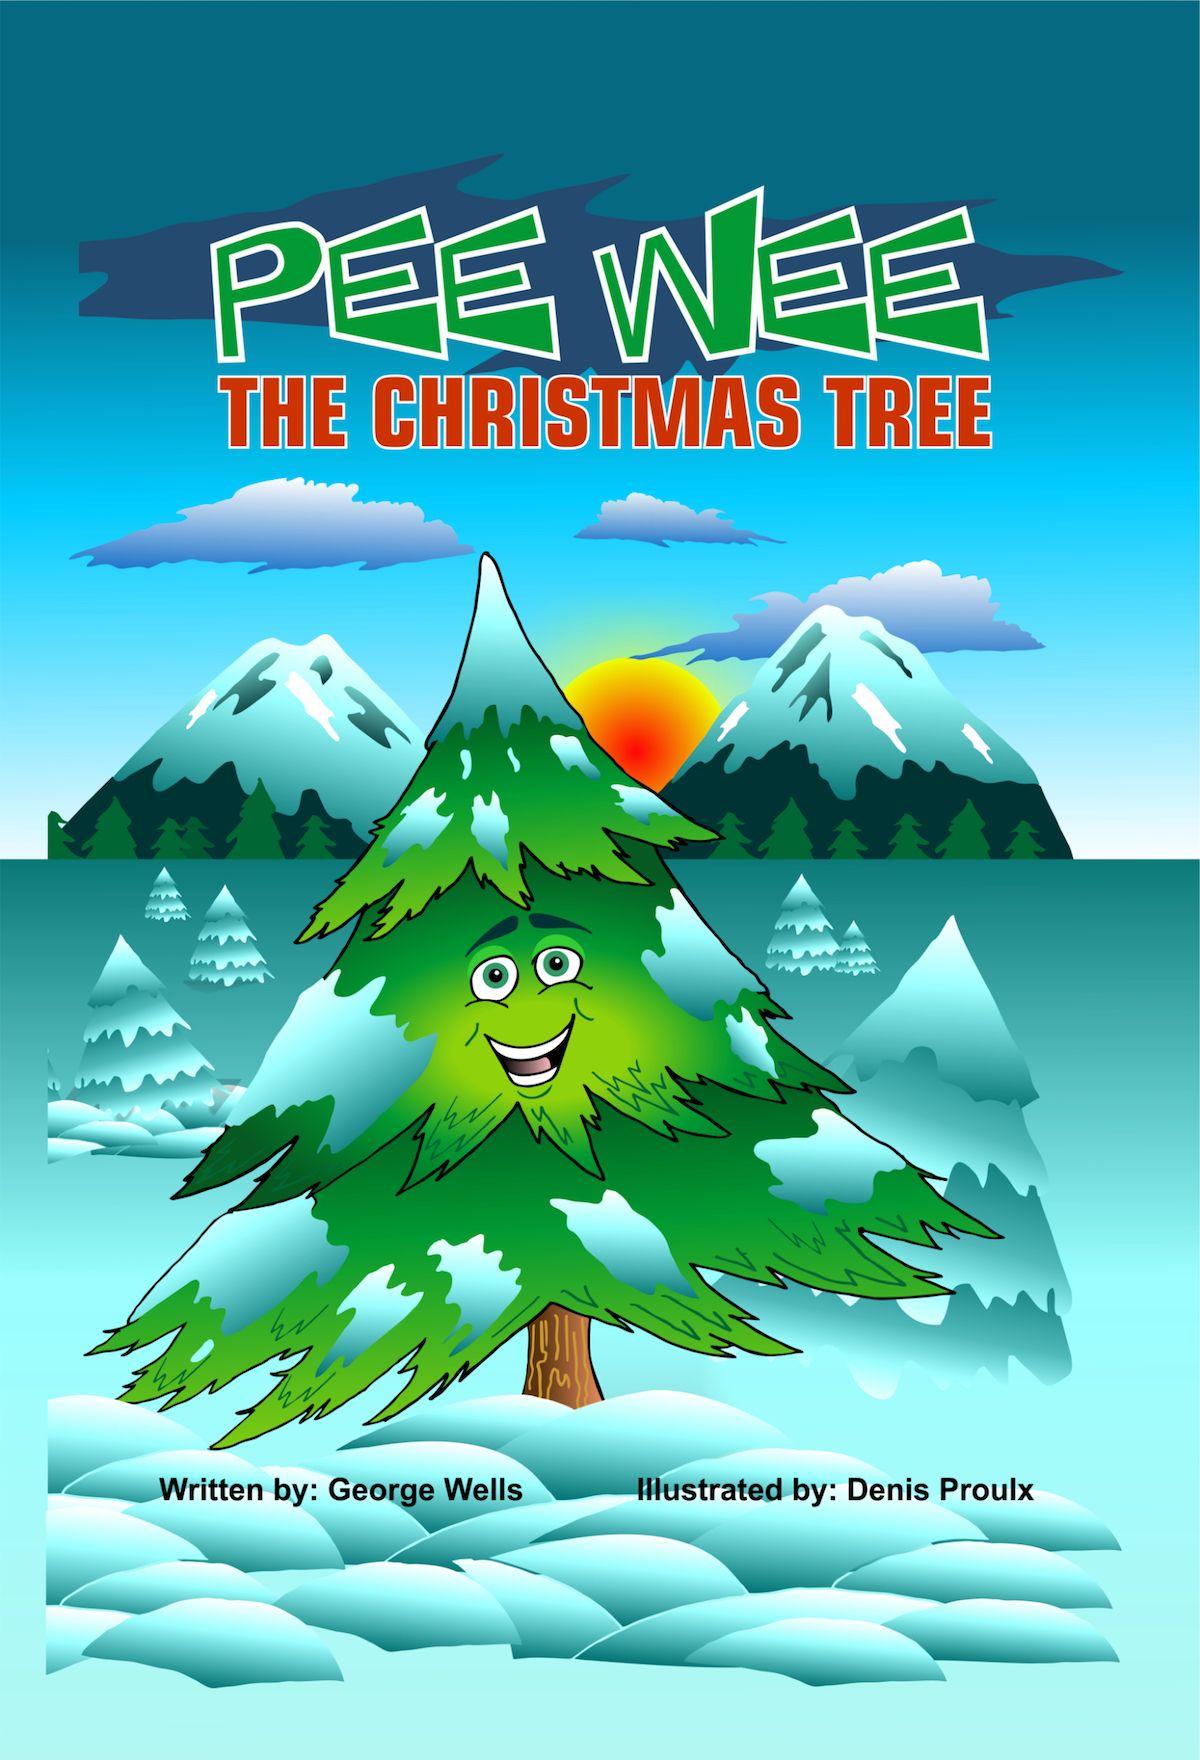 Pee Wee the Christmas Tree